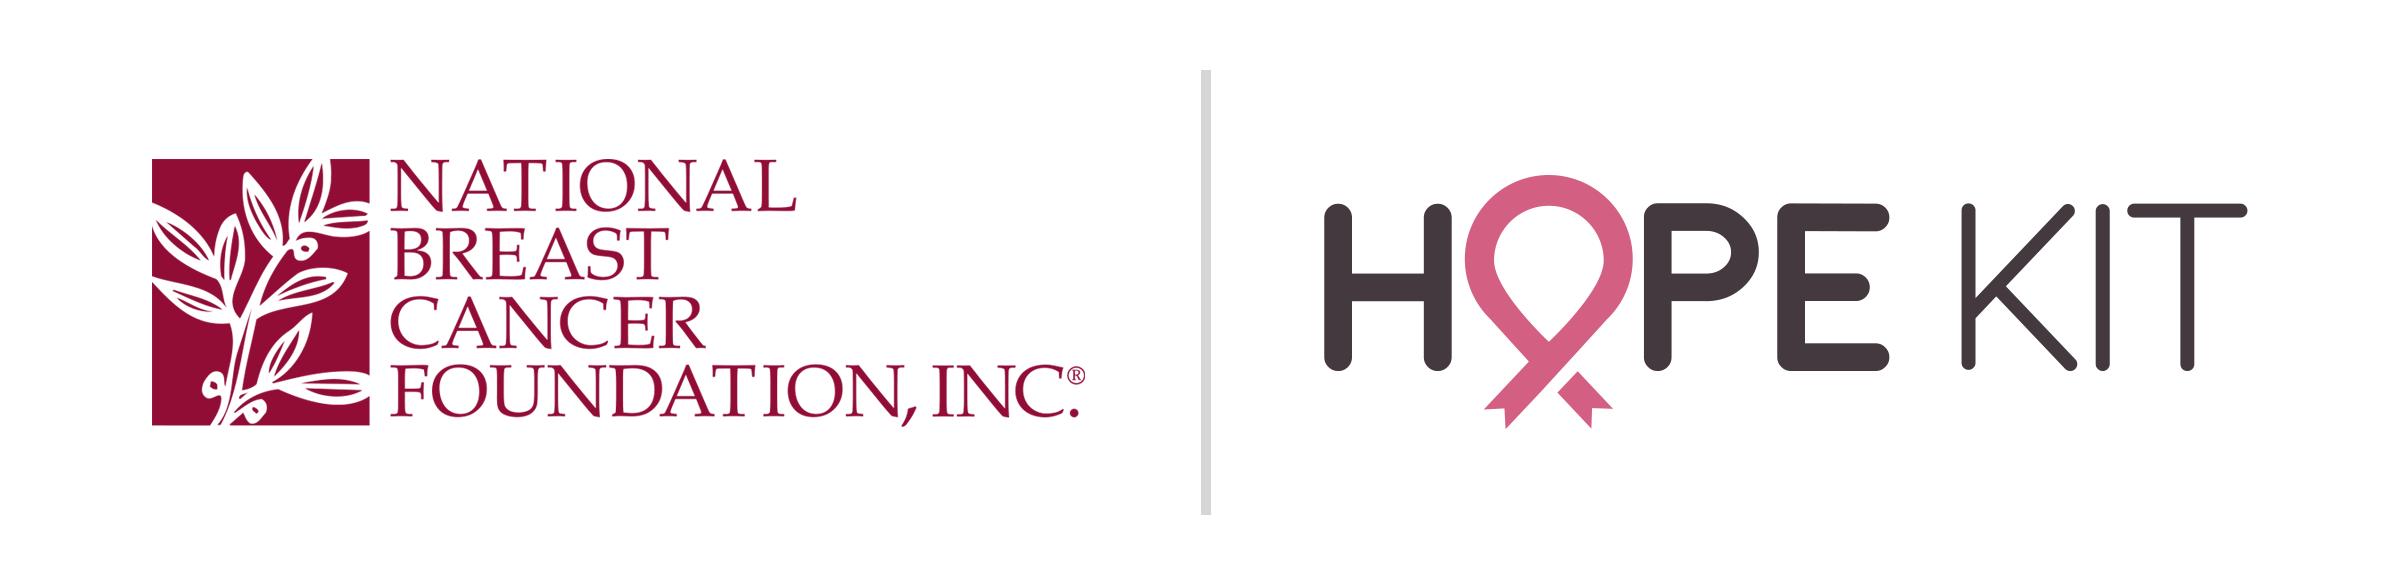 Hope Kit Request (Workflow) Header Image